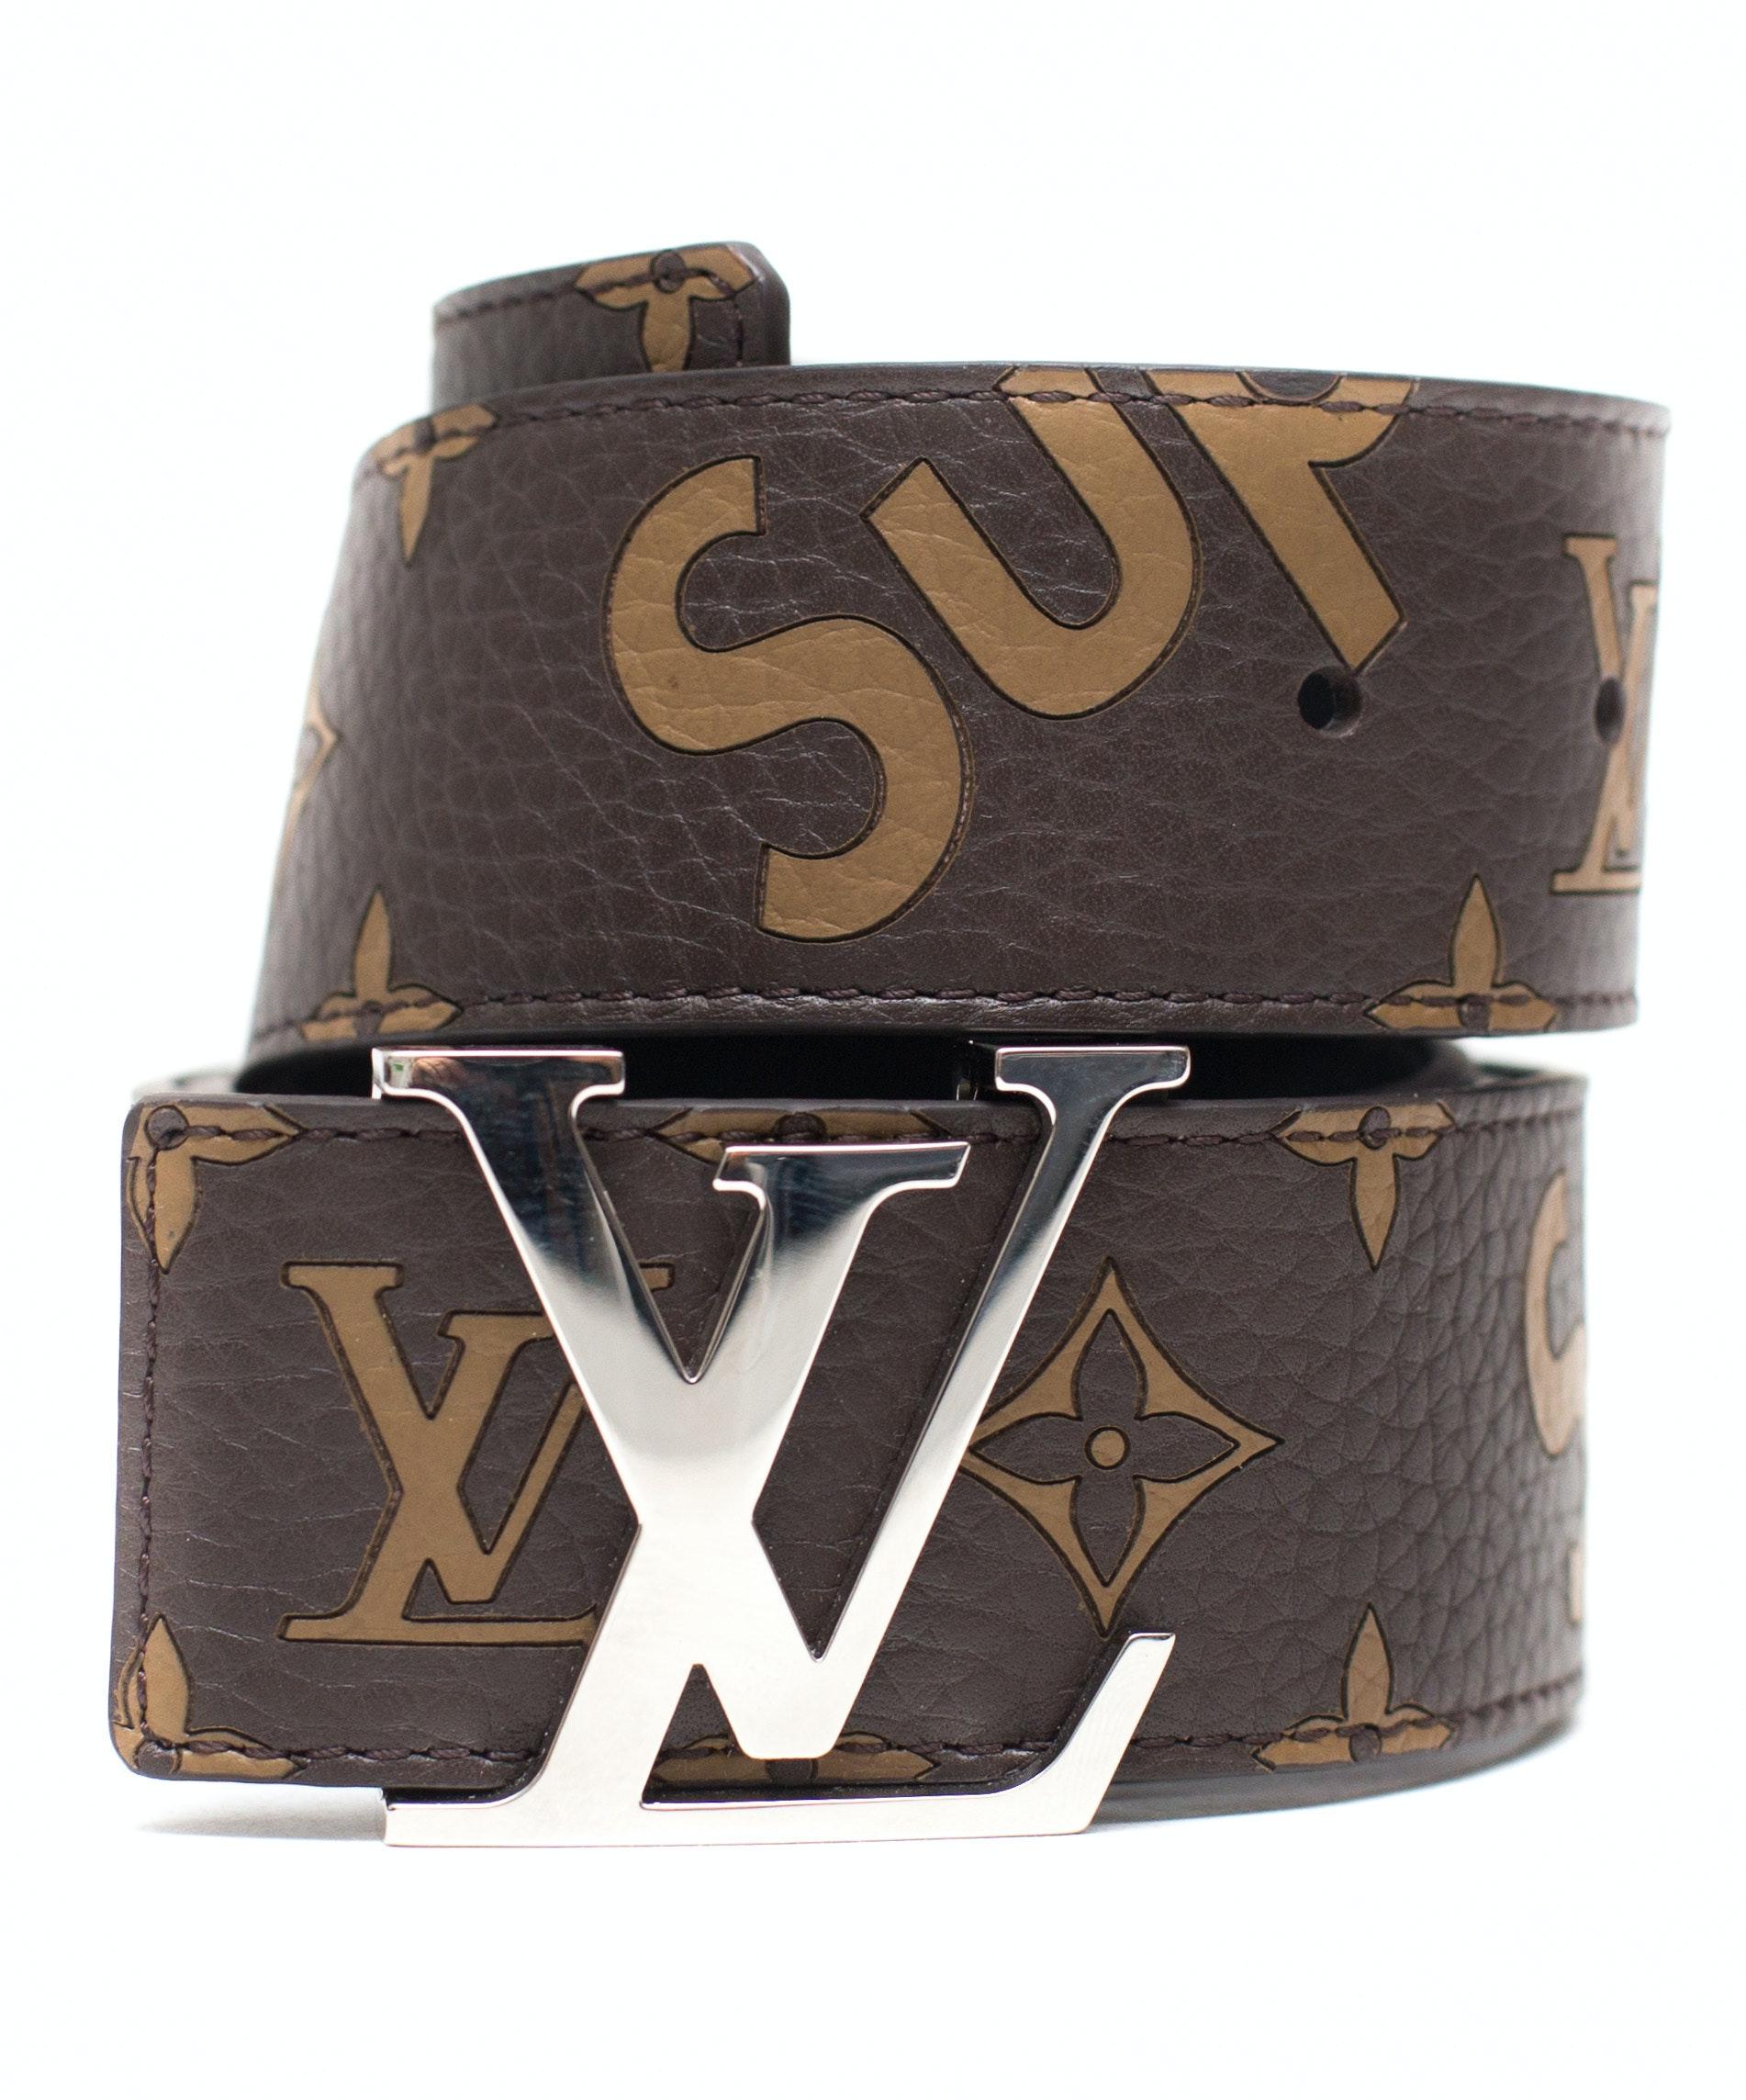 Louis Vuitton x Supreme Initiales Belt 40 MM Monogram Brown Silver